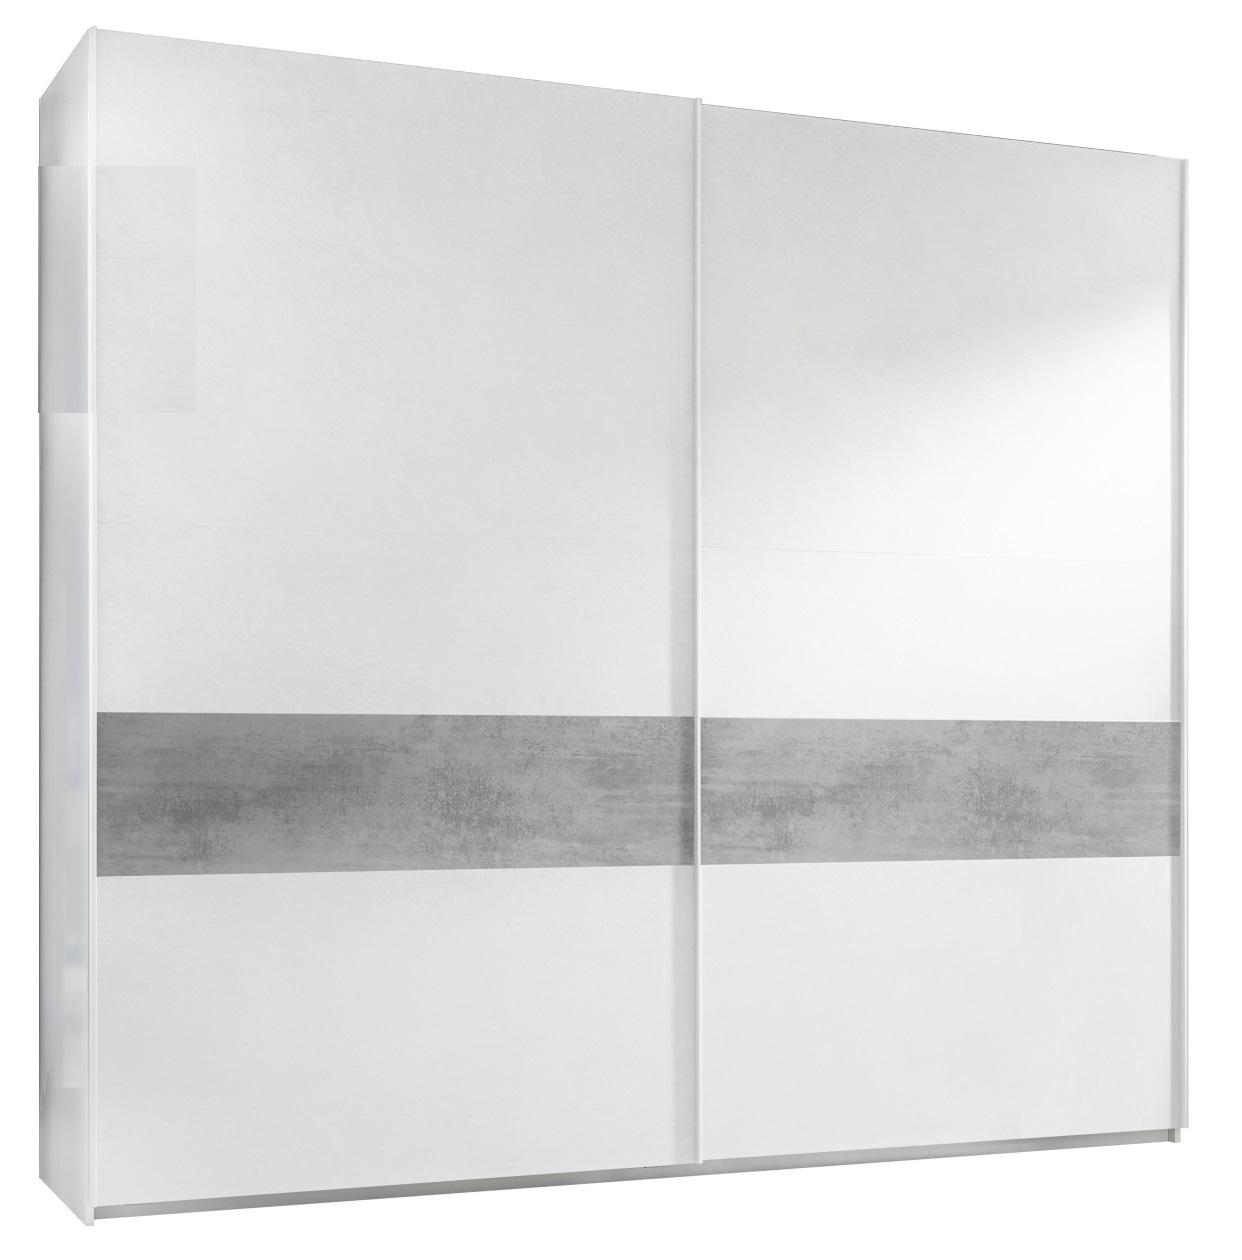 slaapkamerkast zweefdeurkast Amalti Alpaca 275 cm breed in mat wit met grijs beton